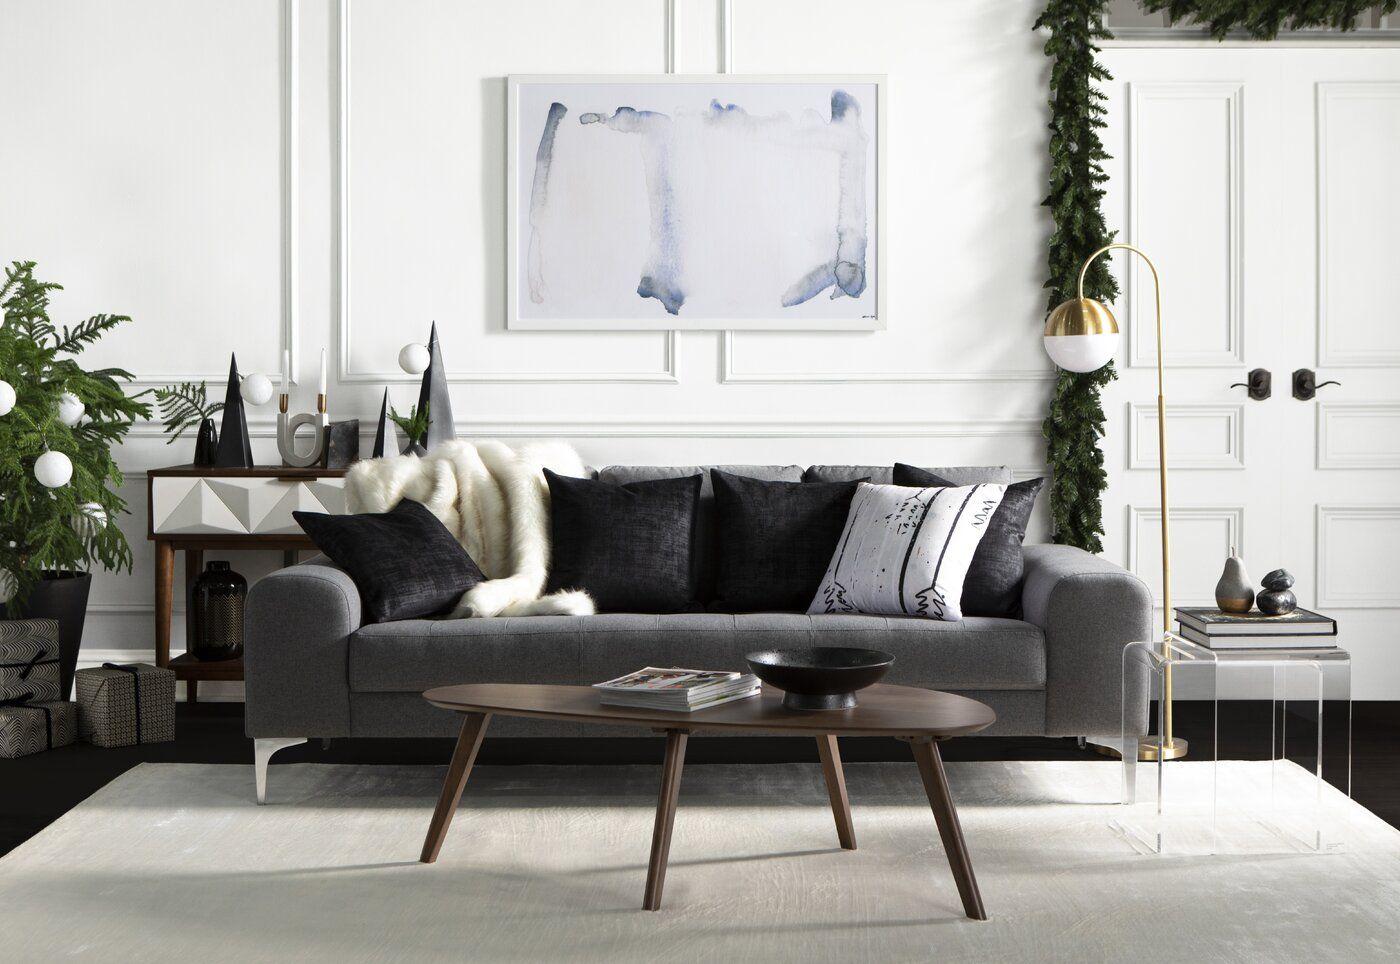 Designer Sofa Tempo Italian Modern Furniture From Natuzzi